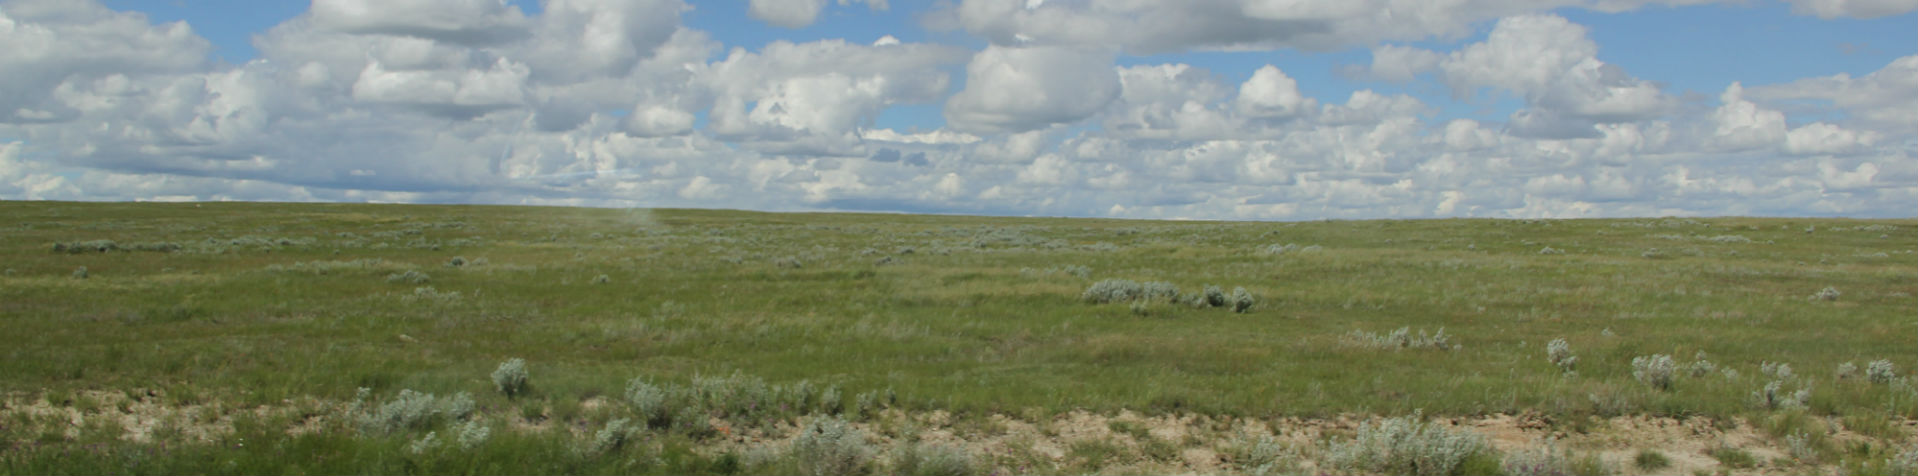 Trudeau Government should Protect Grasslands